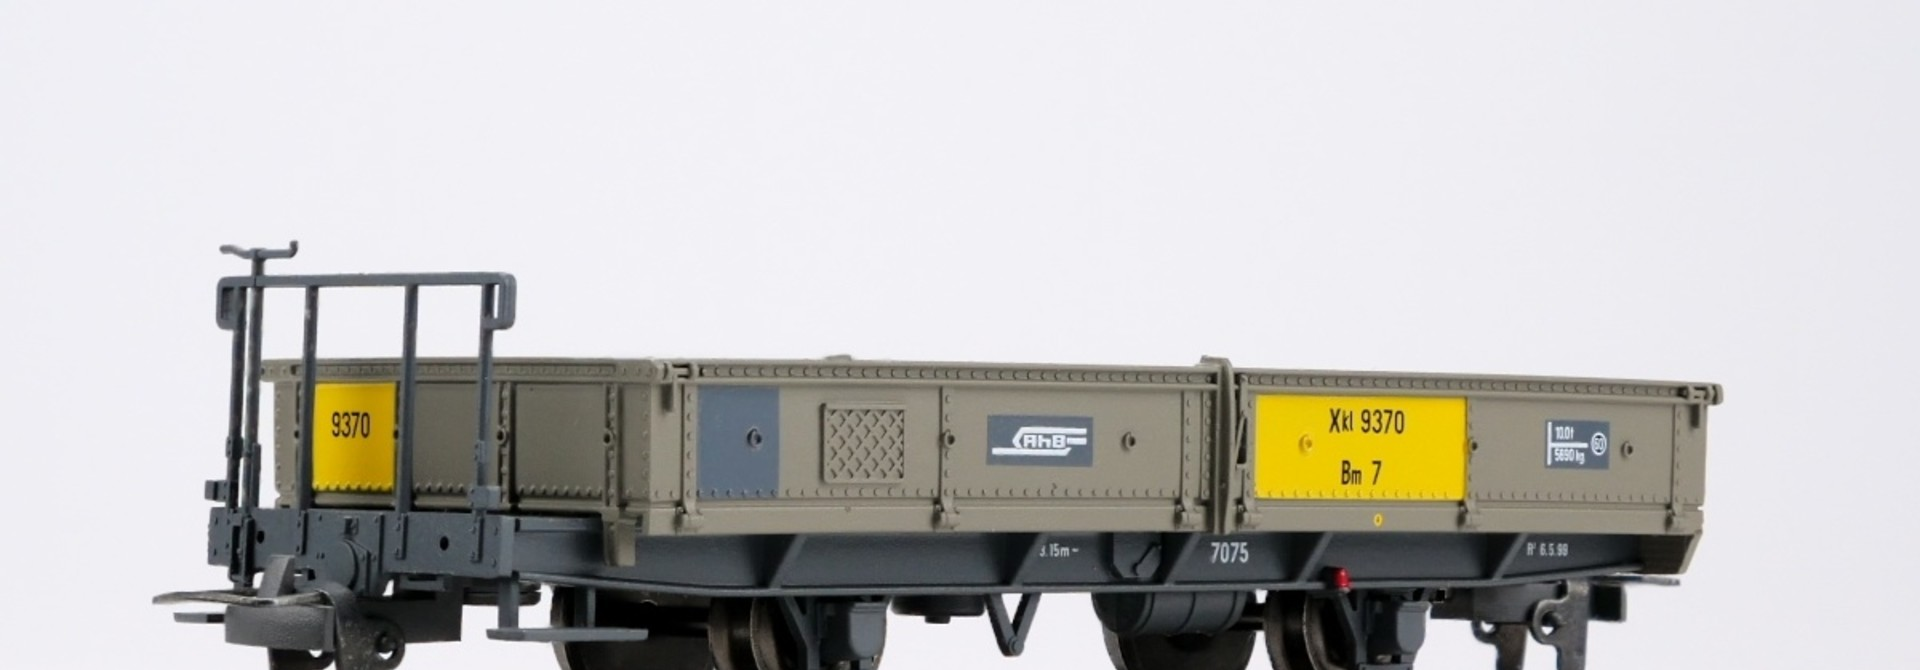 2257190 RhB Xk 9370 Bm7 Niederbordwagen